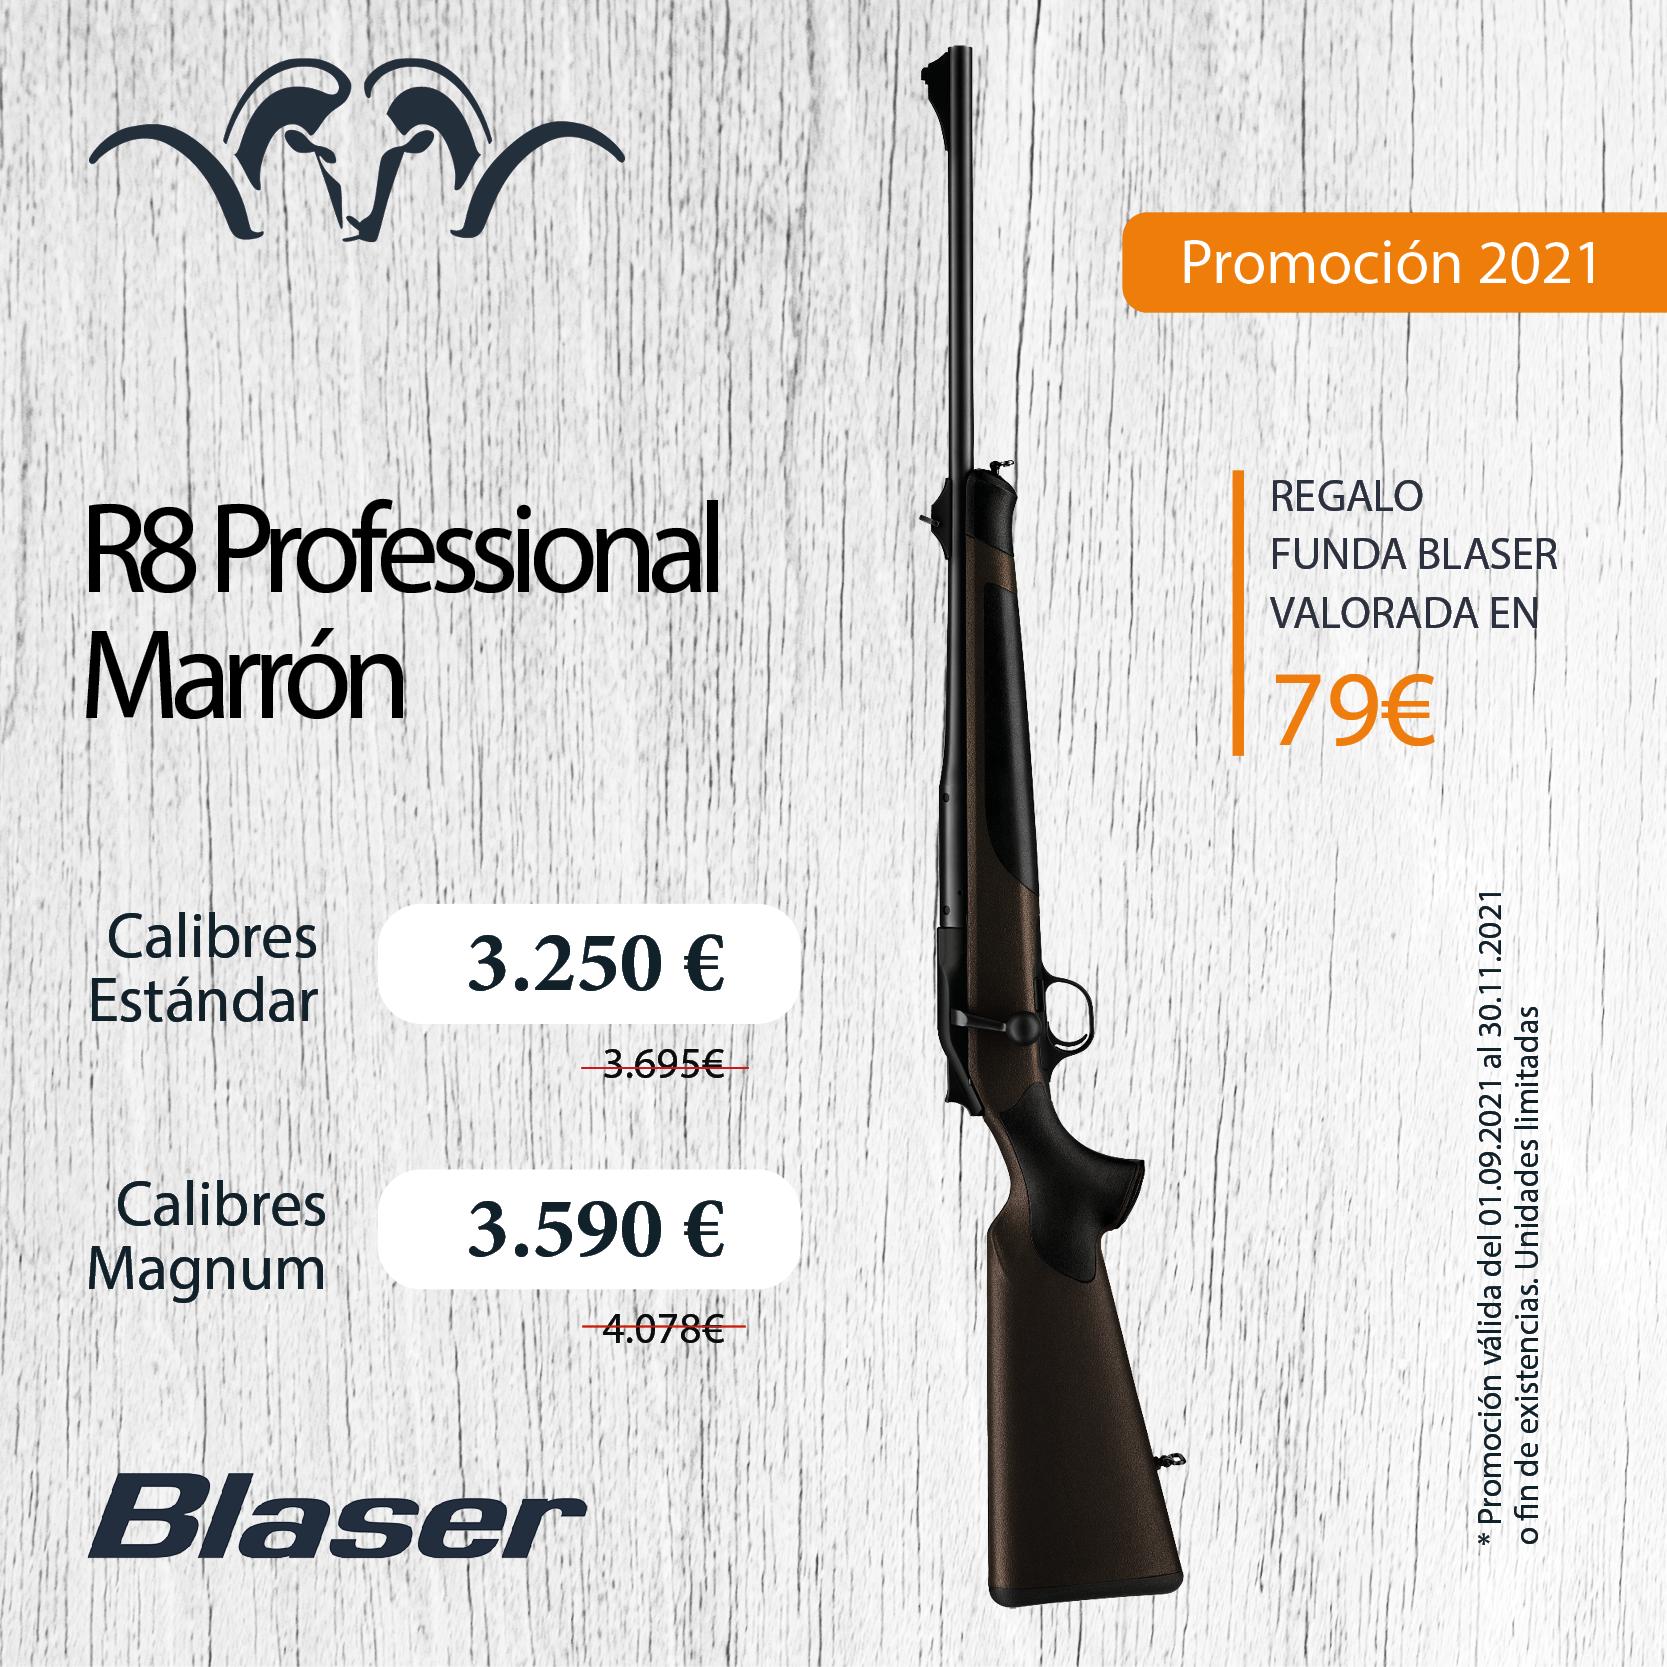 BLASER_Promocion_R8_Professional_Marron_2021_Miniatura